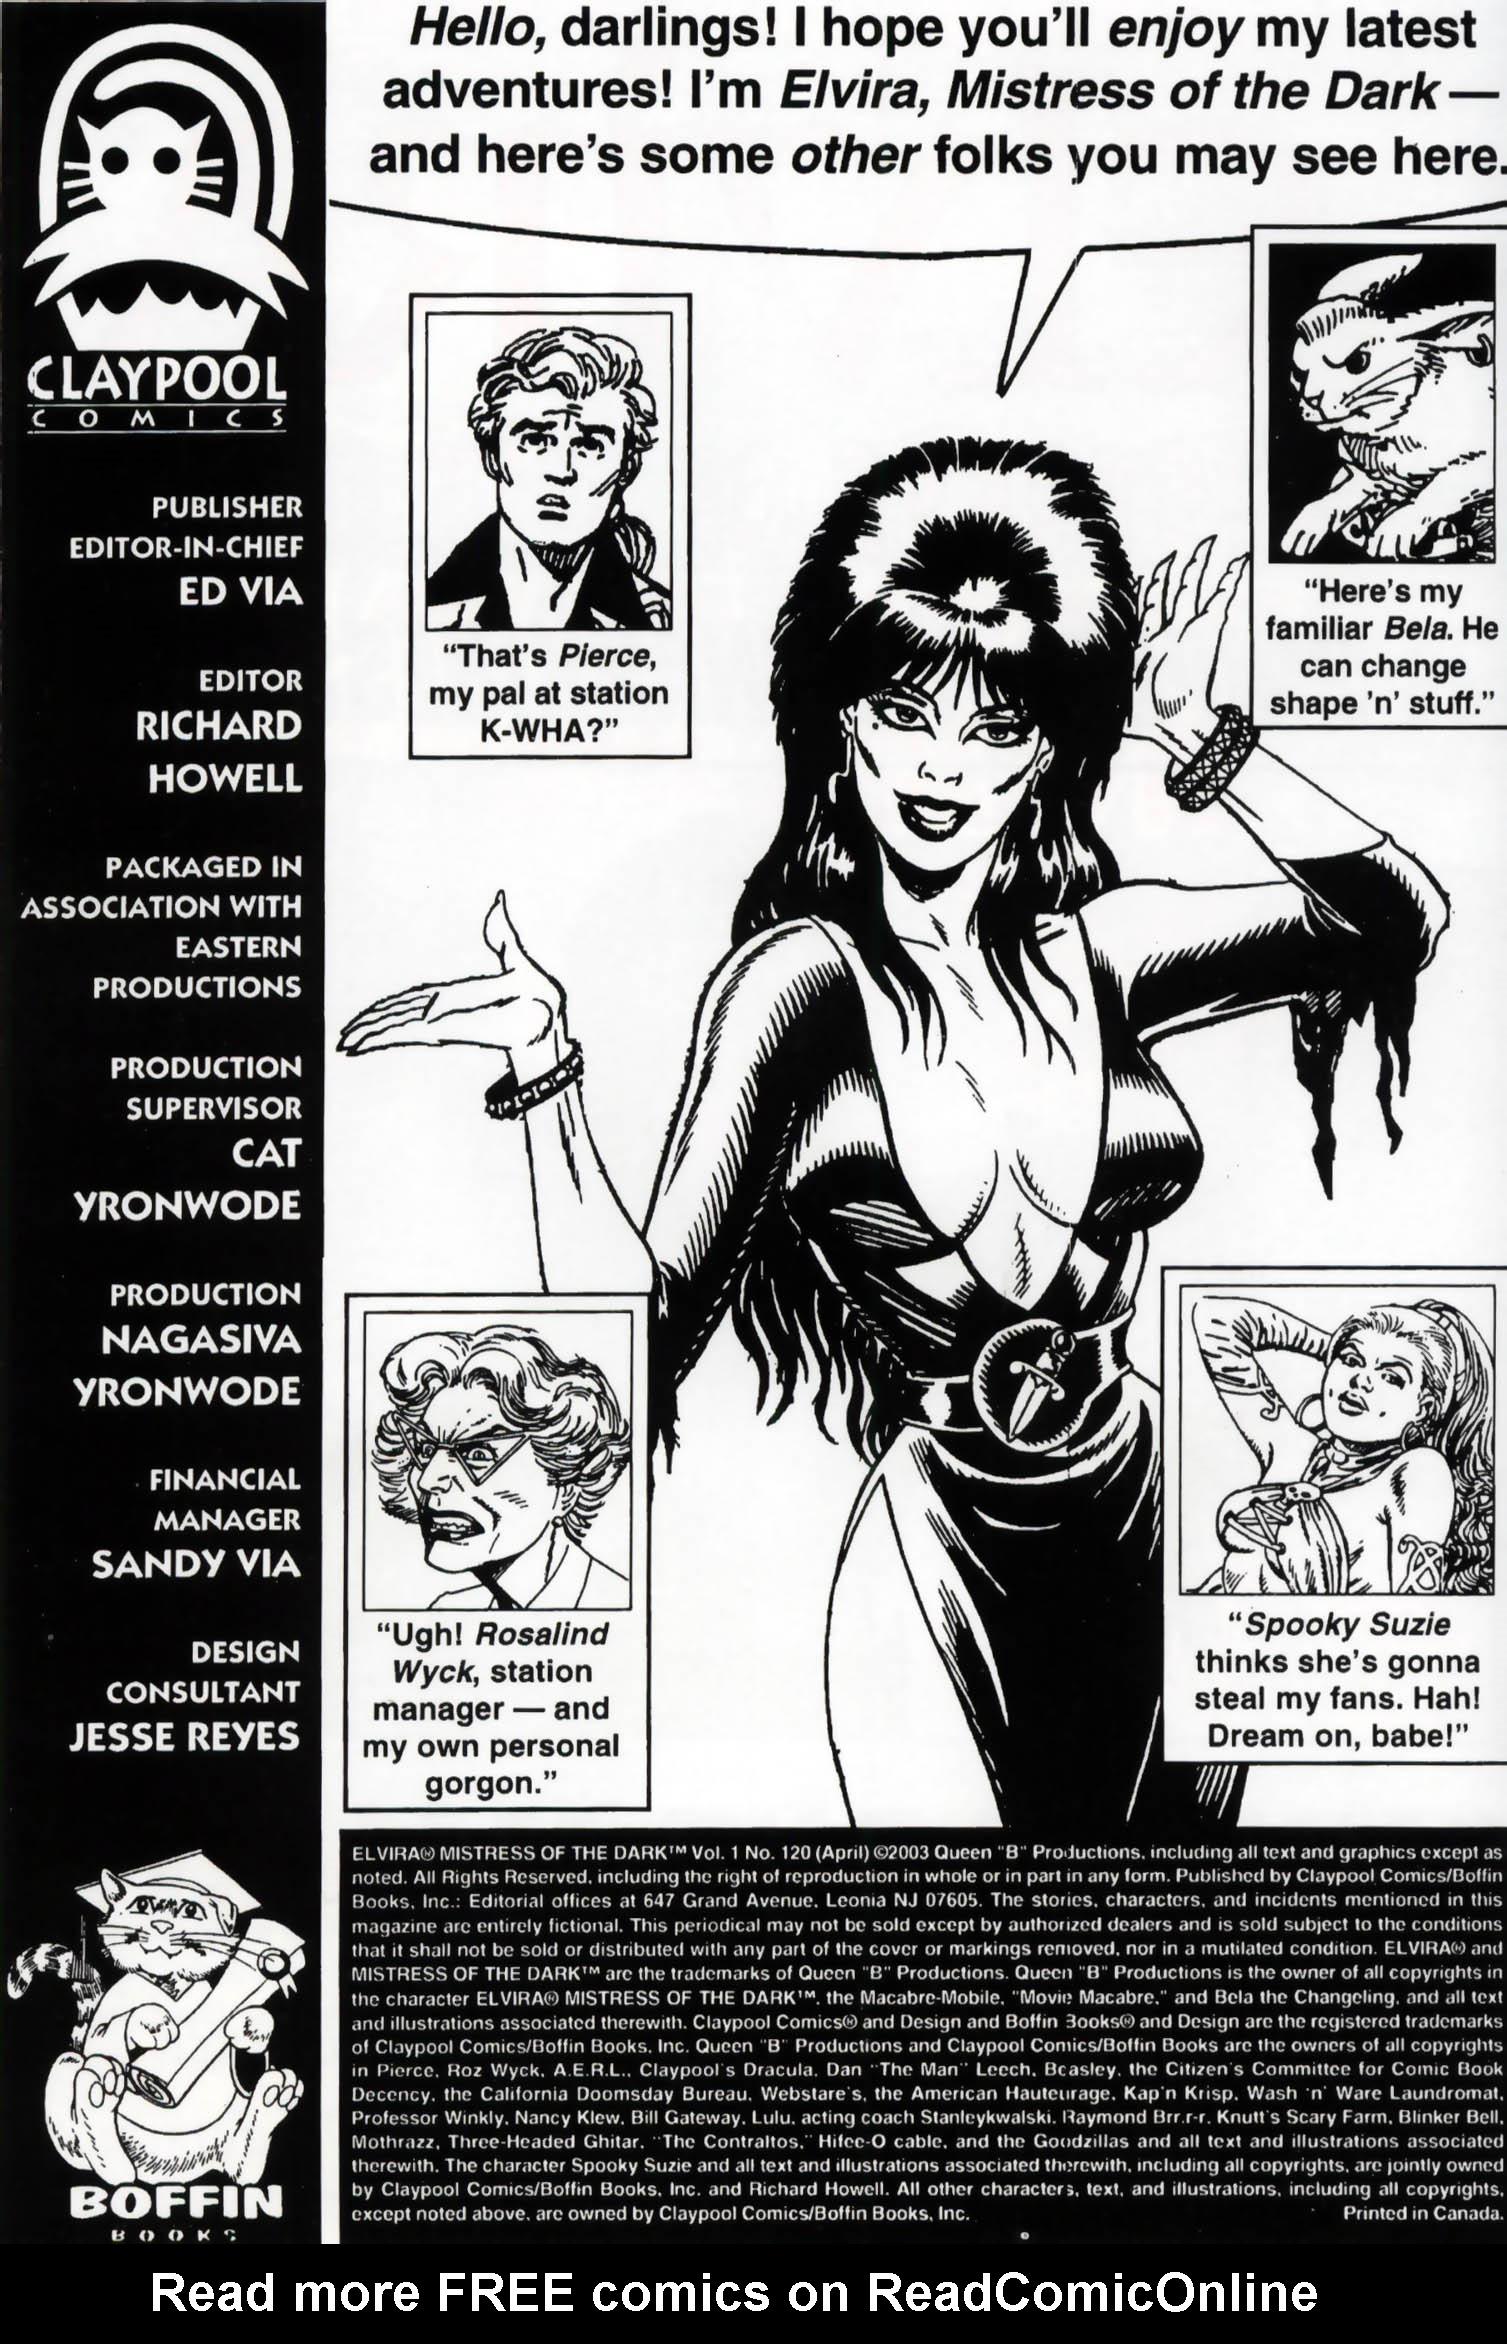 Read online Elvira, Mistress of the Dark comic -  Issue #120 - 2